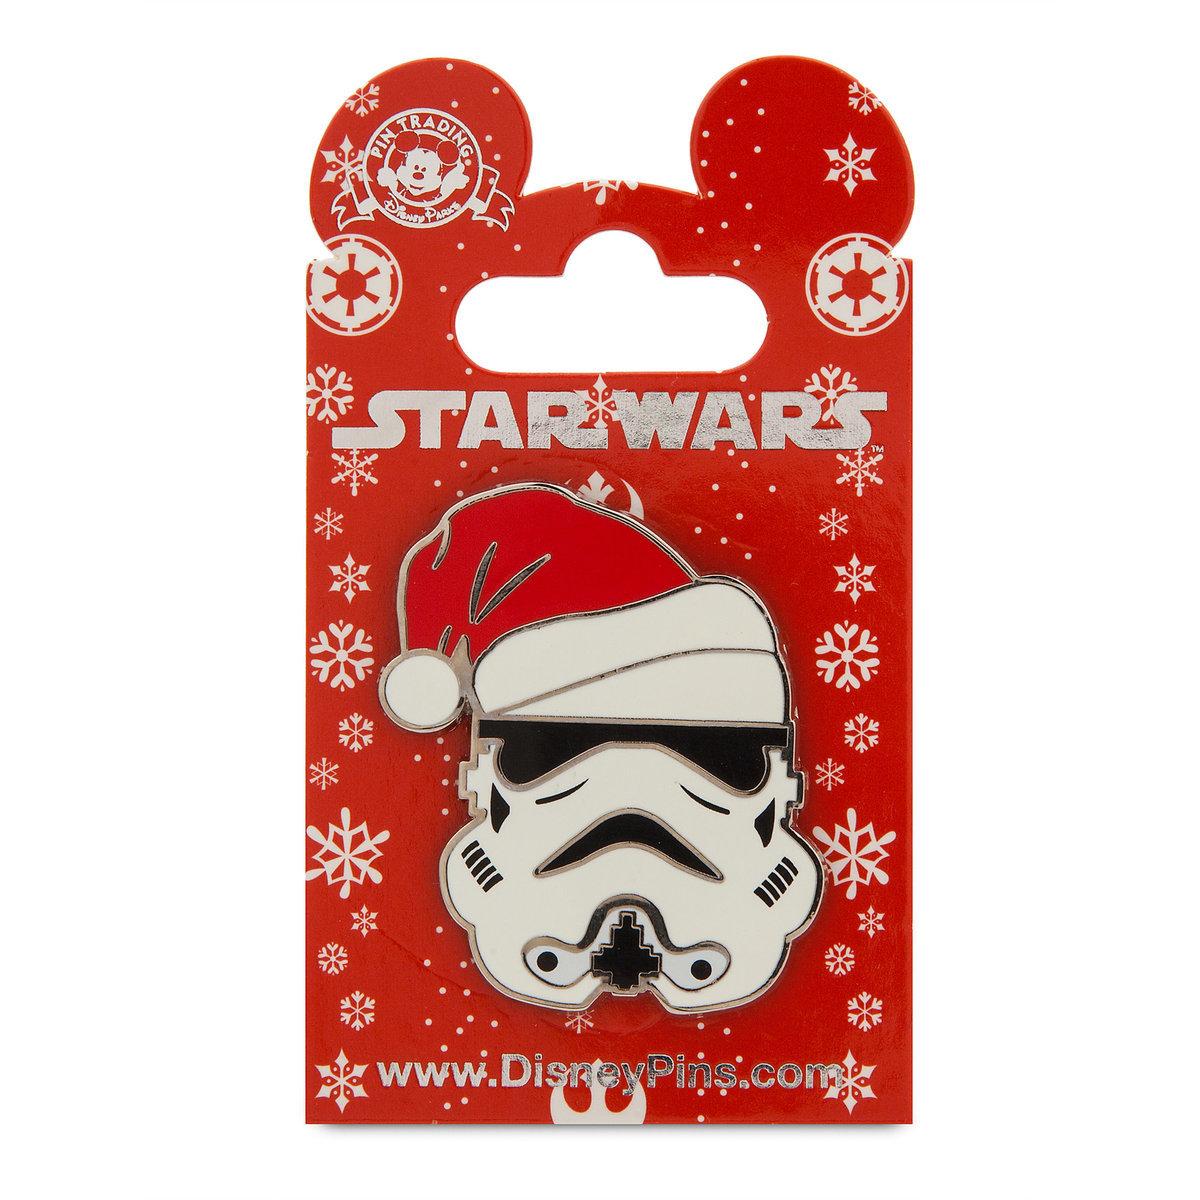 6cf76d22a1607 Disney Holiday Pin - Star Wars - Stormtrooper in Santa Hat